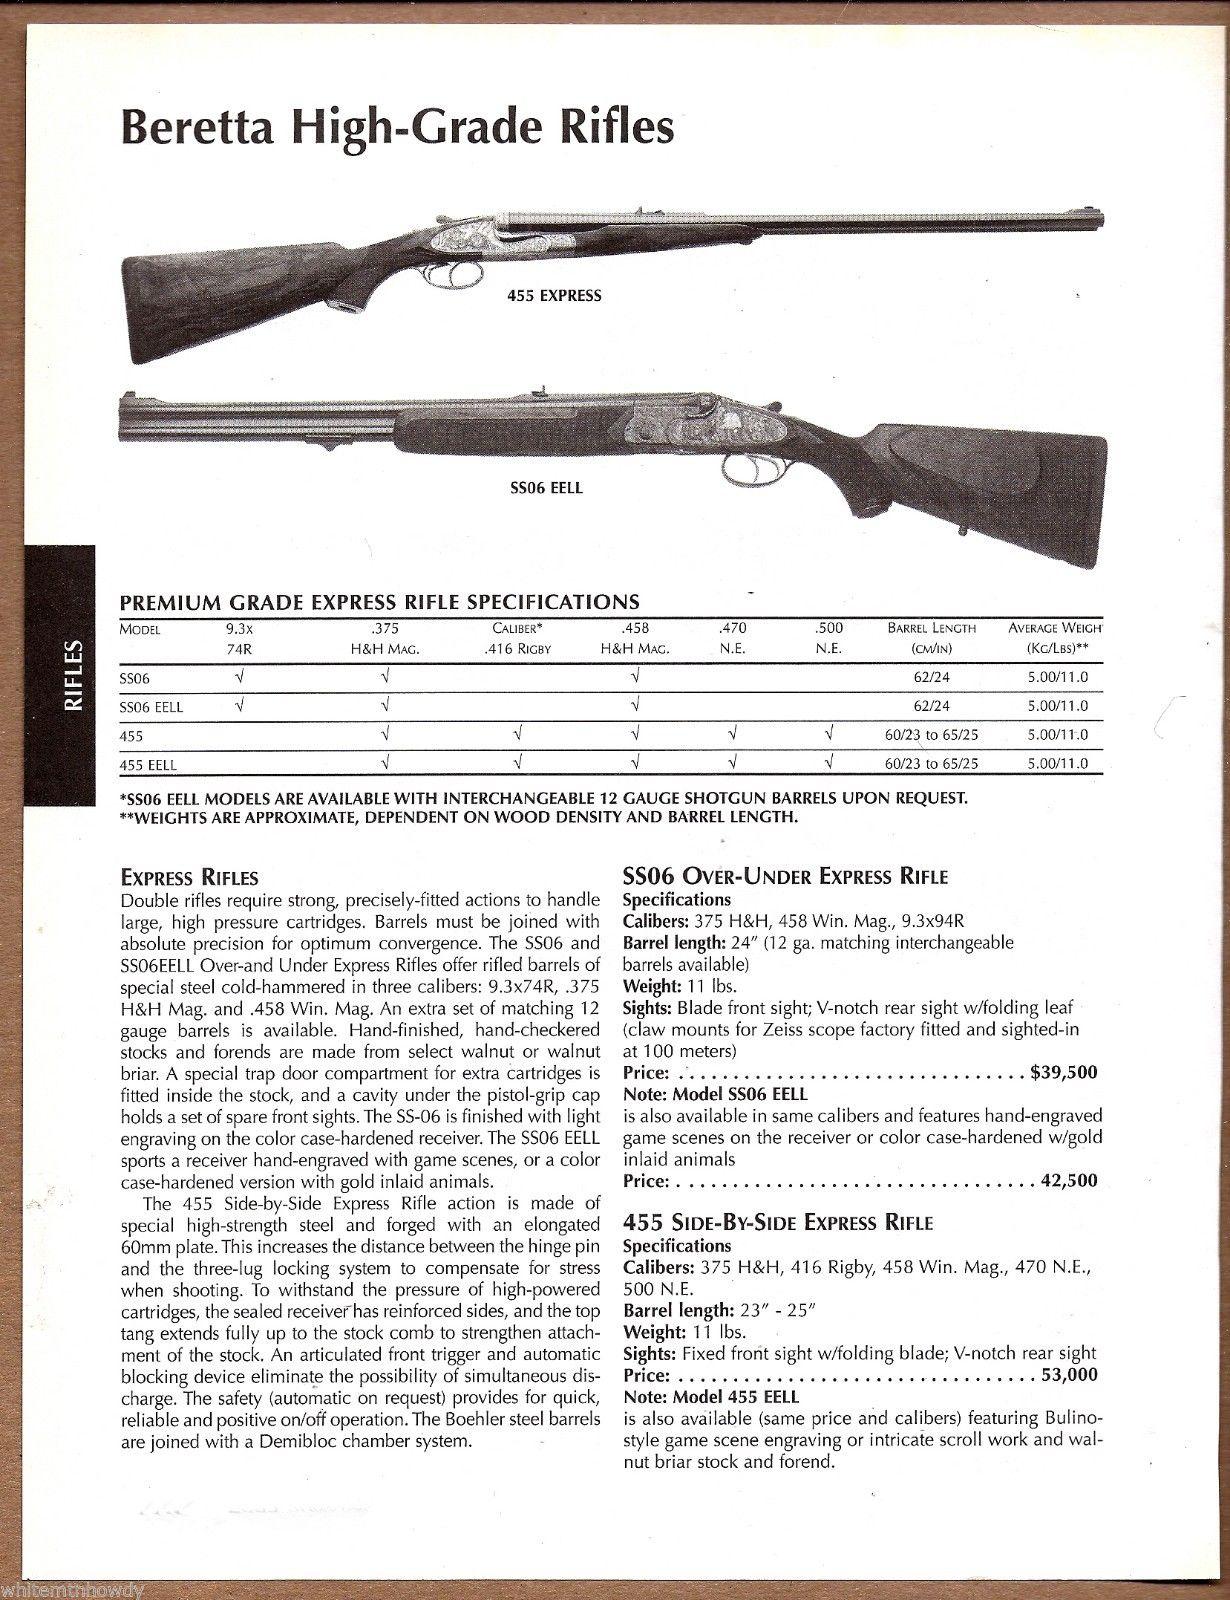 Original newspaper advertisement featuring the Beretta 455. (Picture courtesy E-bay).